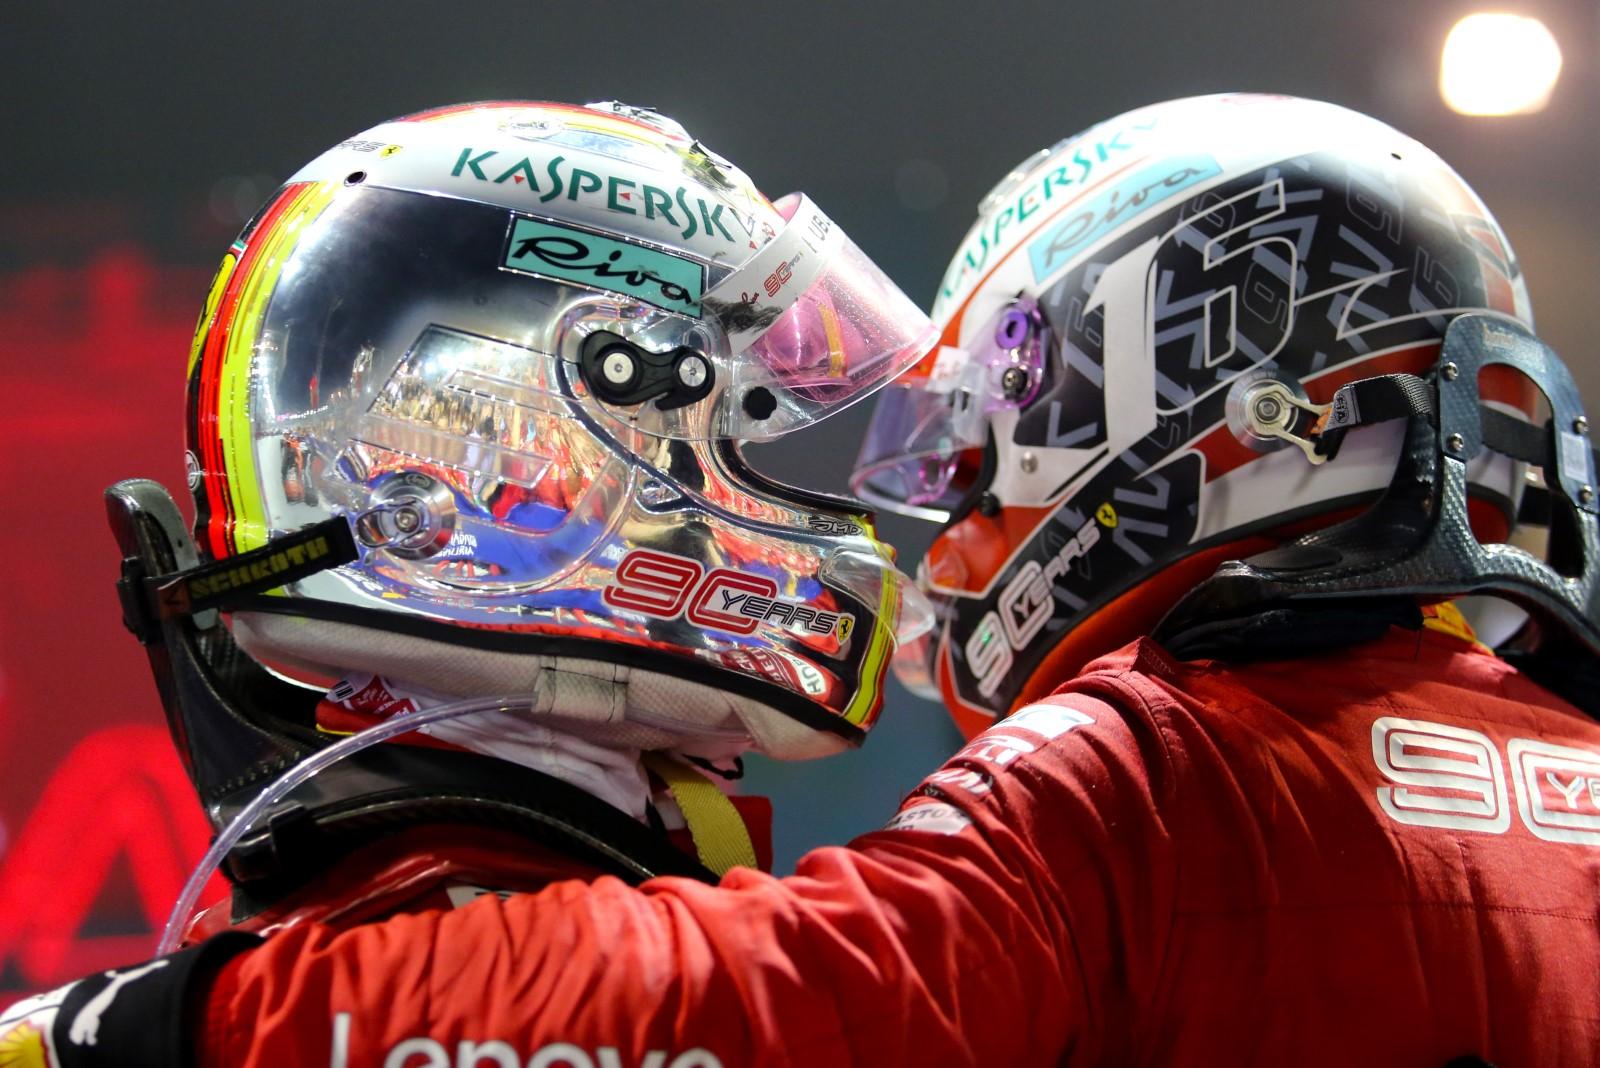 Sebastian Vettel to leave Ferrari at end of the season